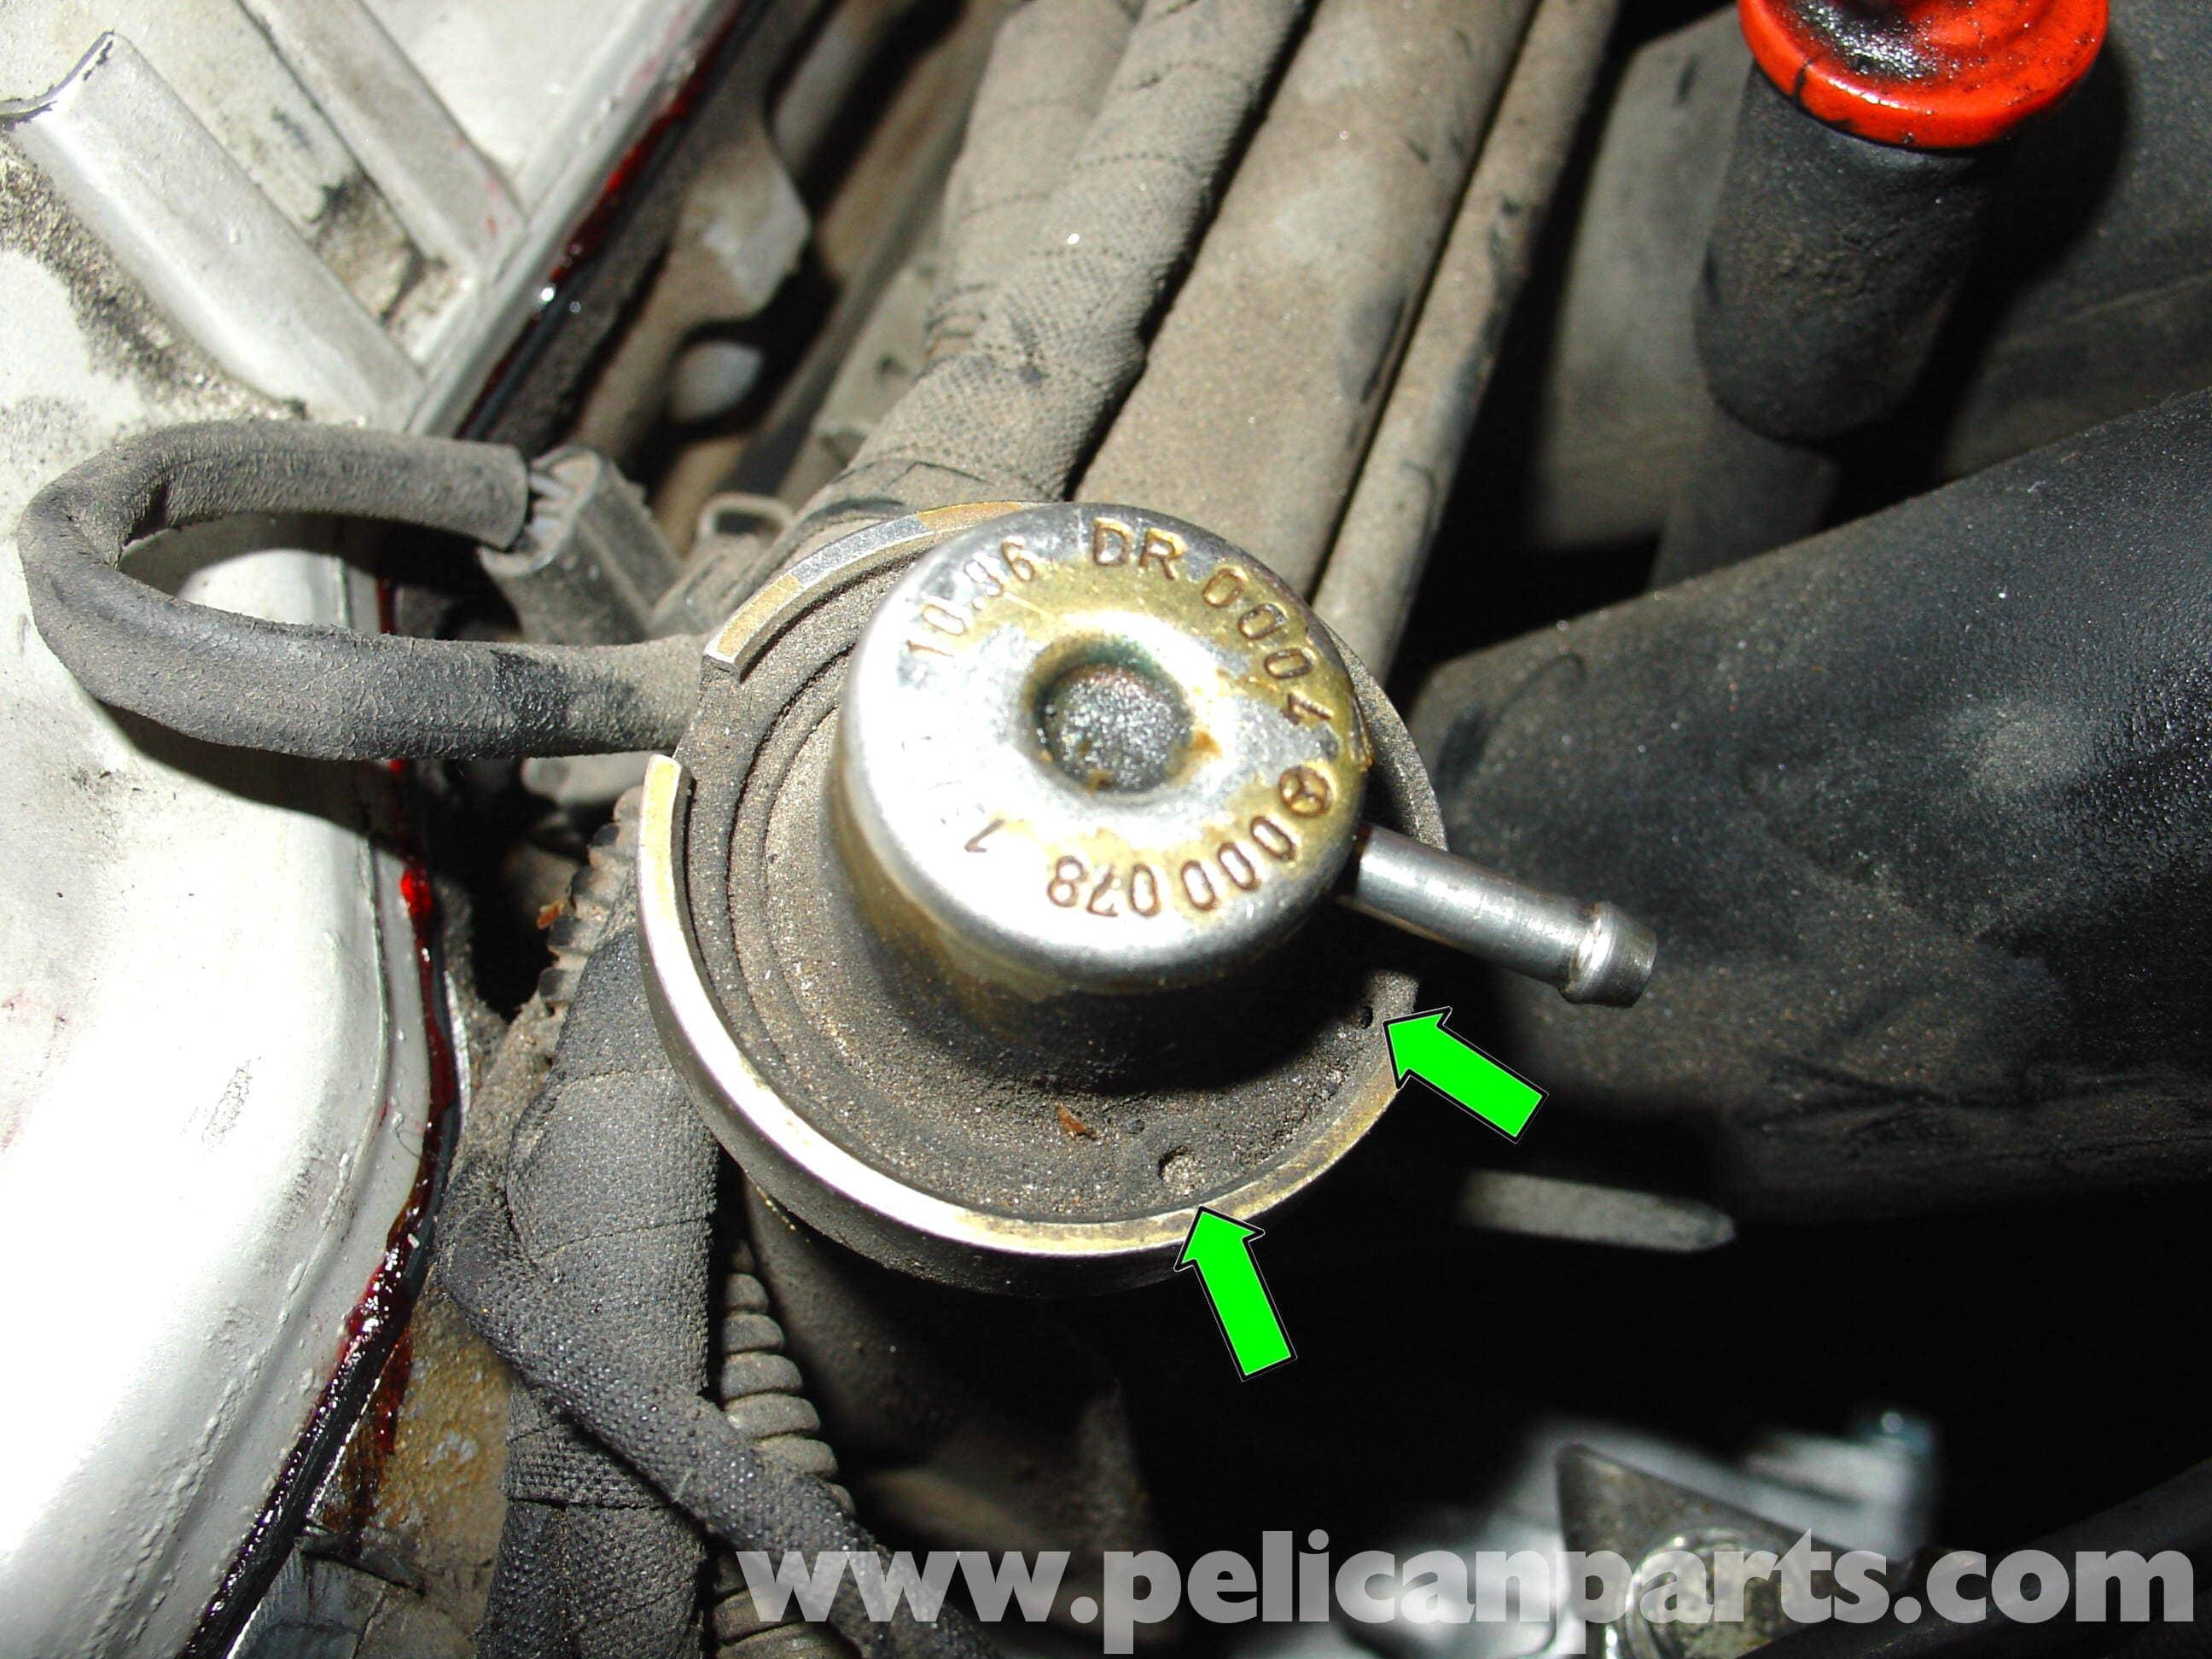 Fuse Diagram Mercedes Benz W210 Fuel Pressure Regulator Replacement